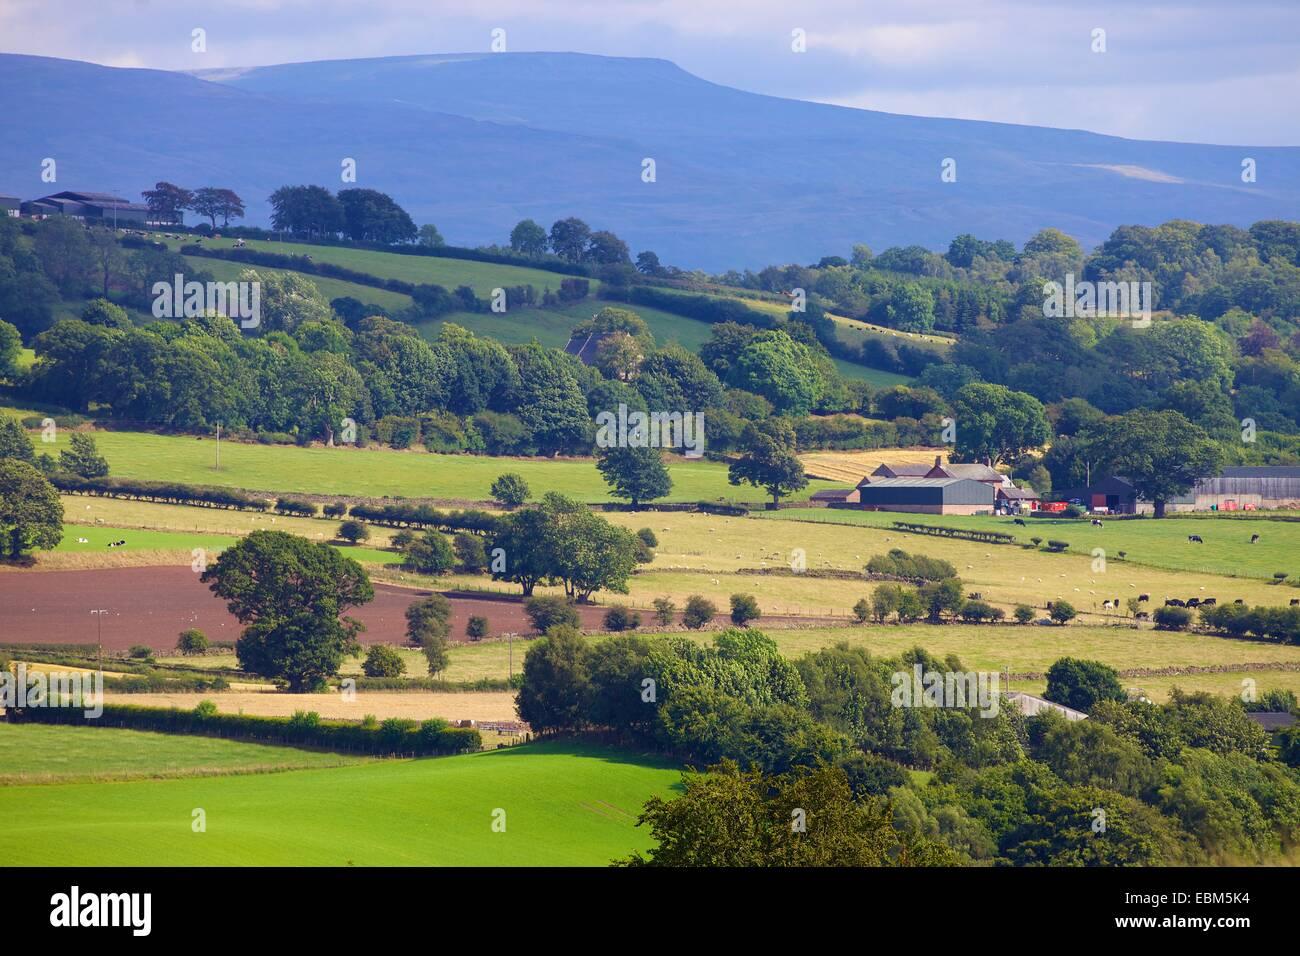 Eden Valley, Cumbria, Settle to Carlisle Railway Line, England, UK. - Stock Image